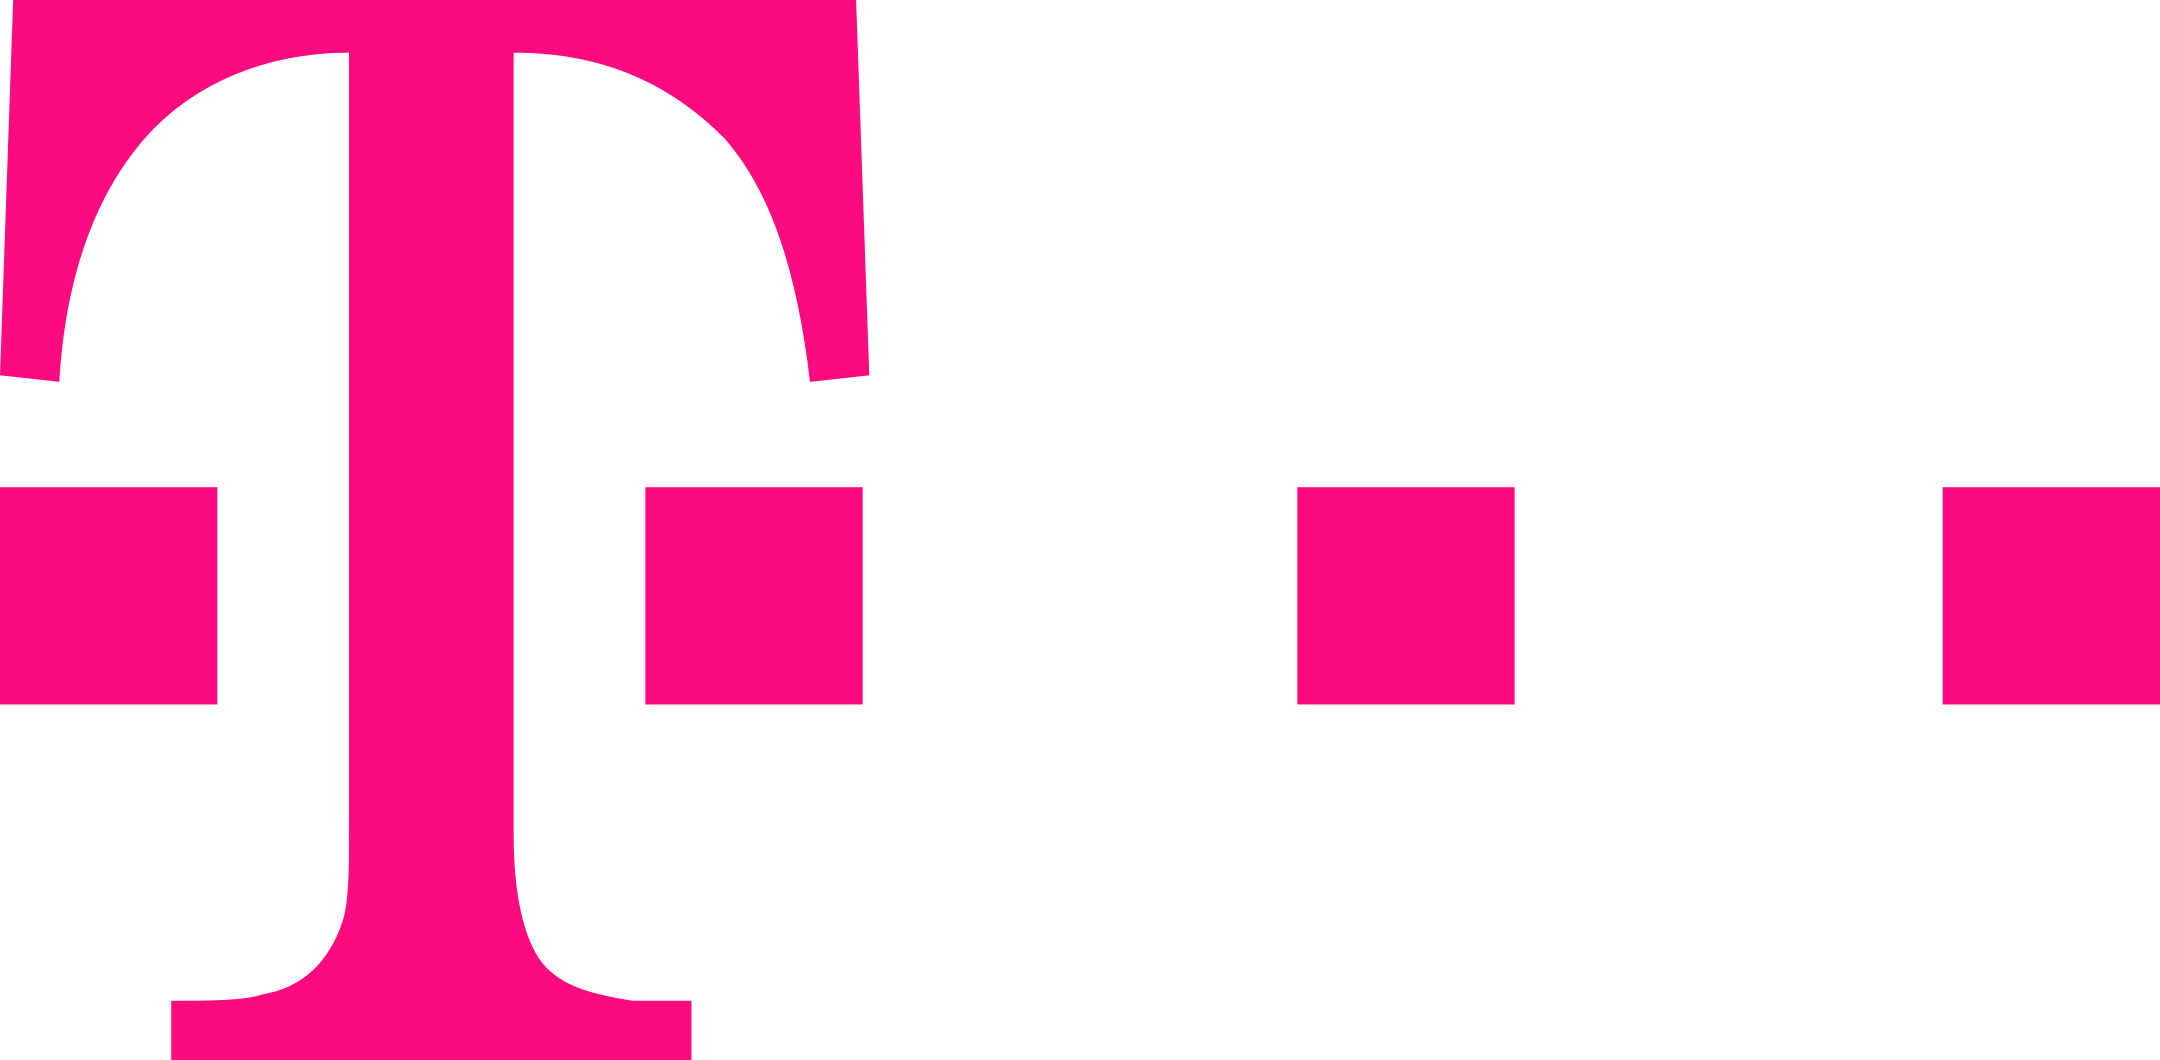 deutsche telekom logo 3 - Deutsche Telekom Logo